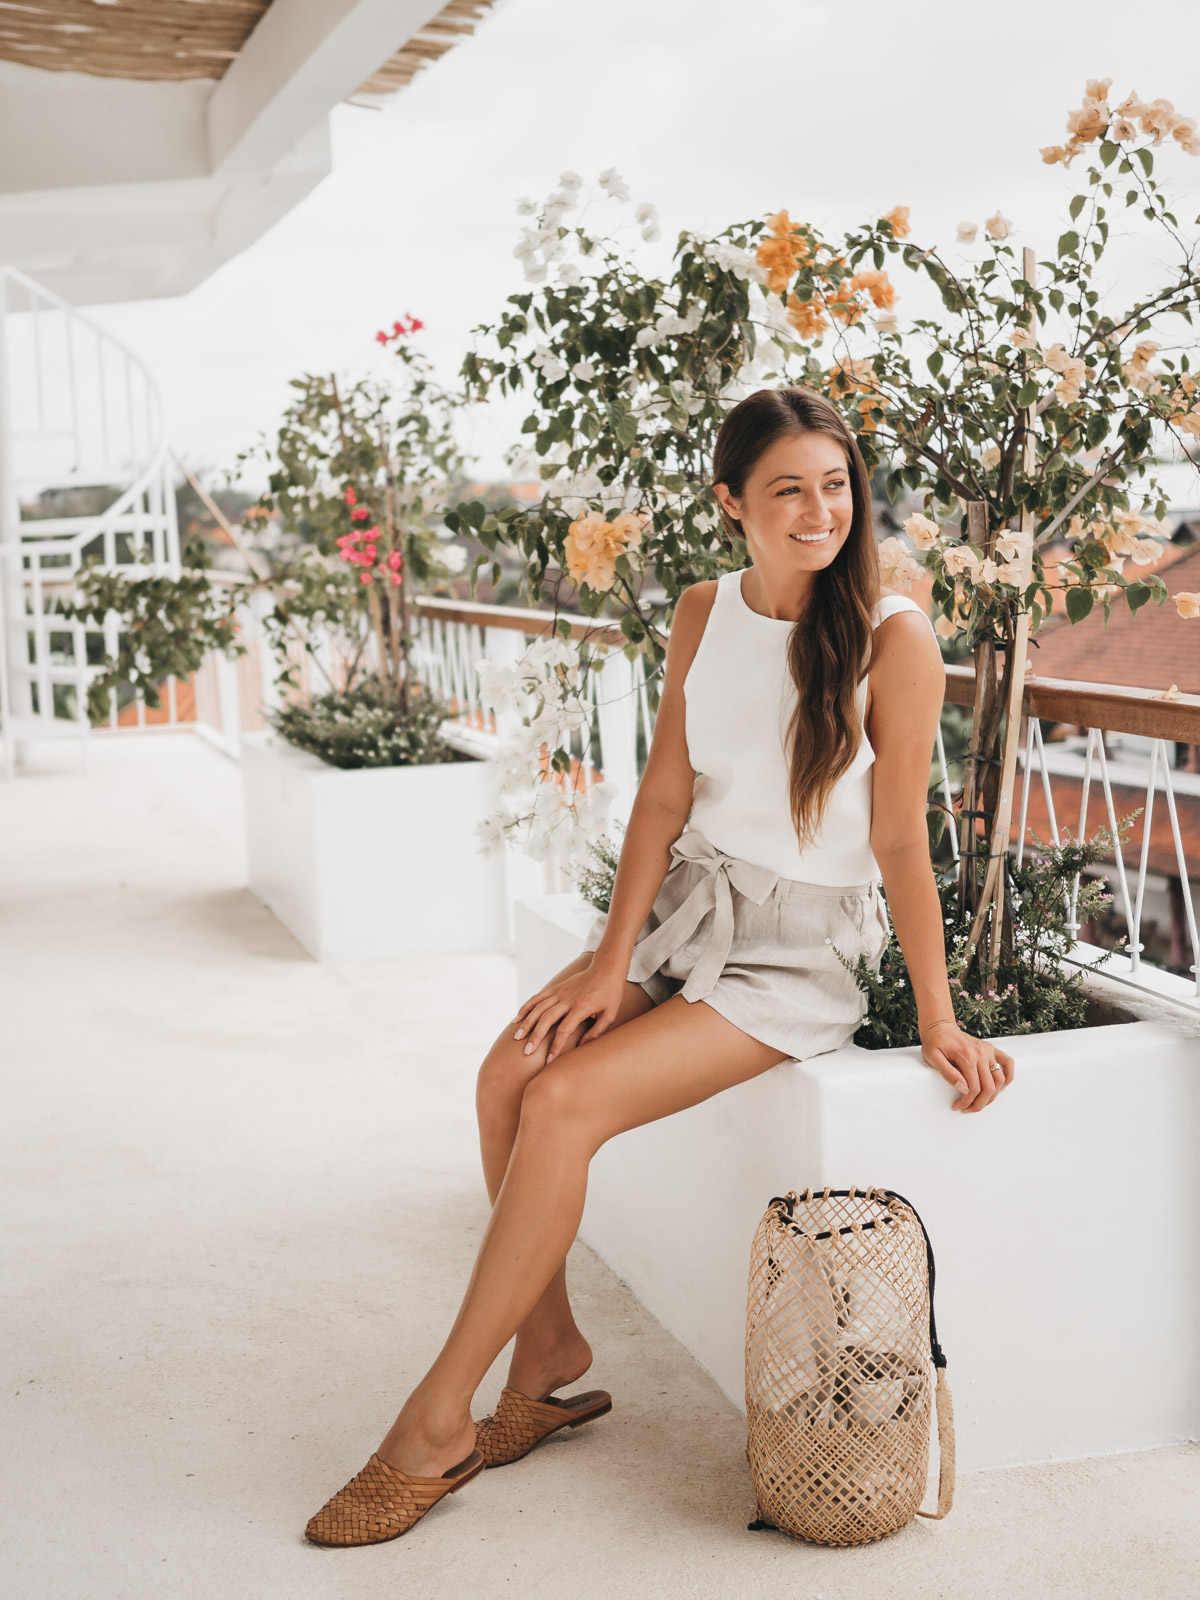 keira_mason+Vegan_resort_wear-1.jpg